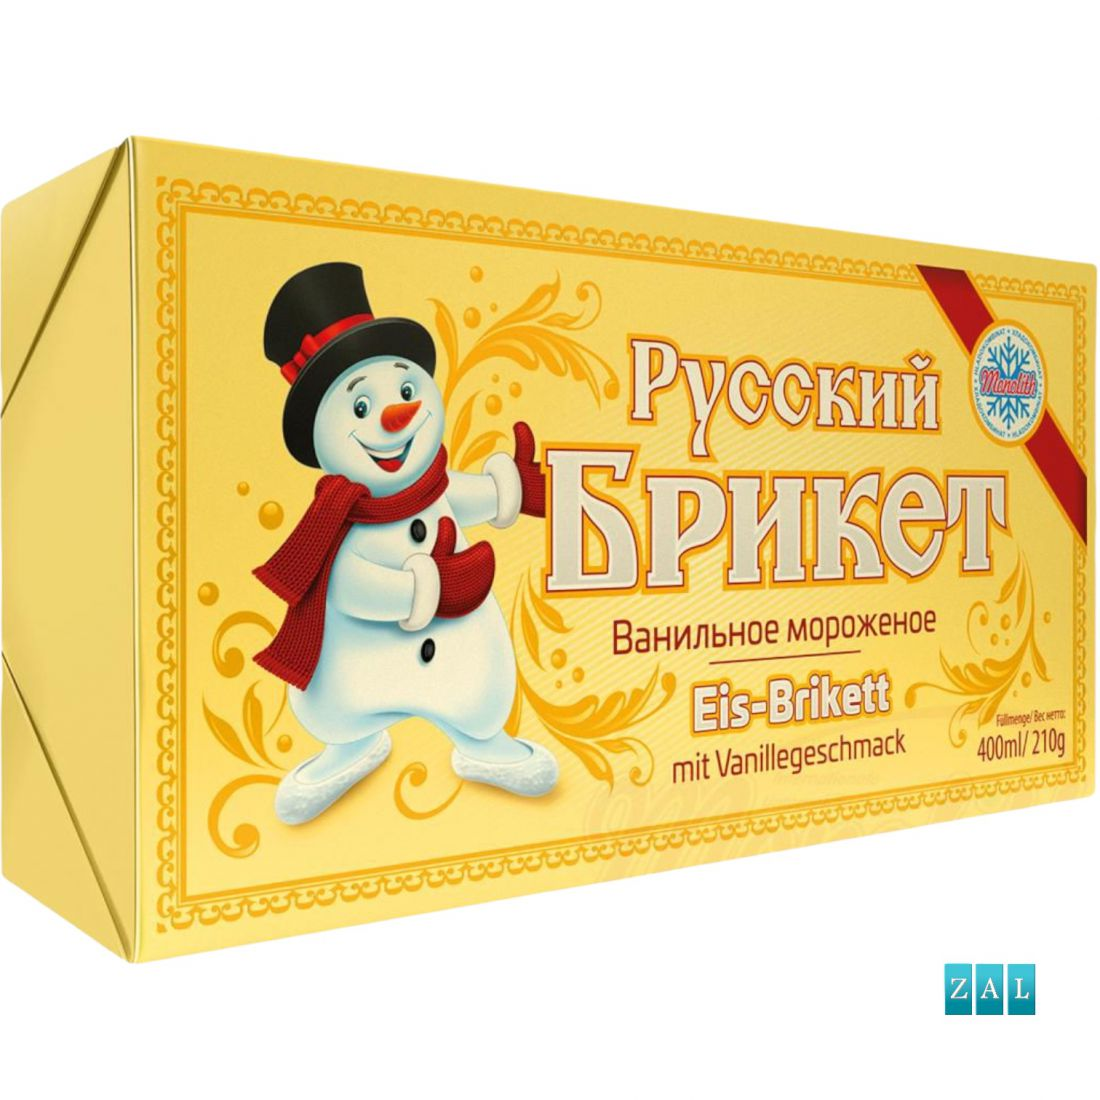 """Plombir Russzkij"" tejszínes jégkrém 210g"